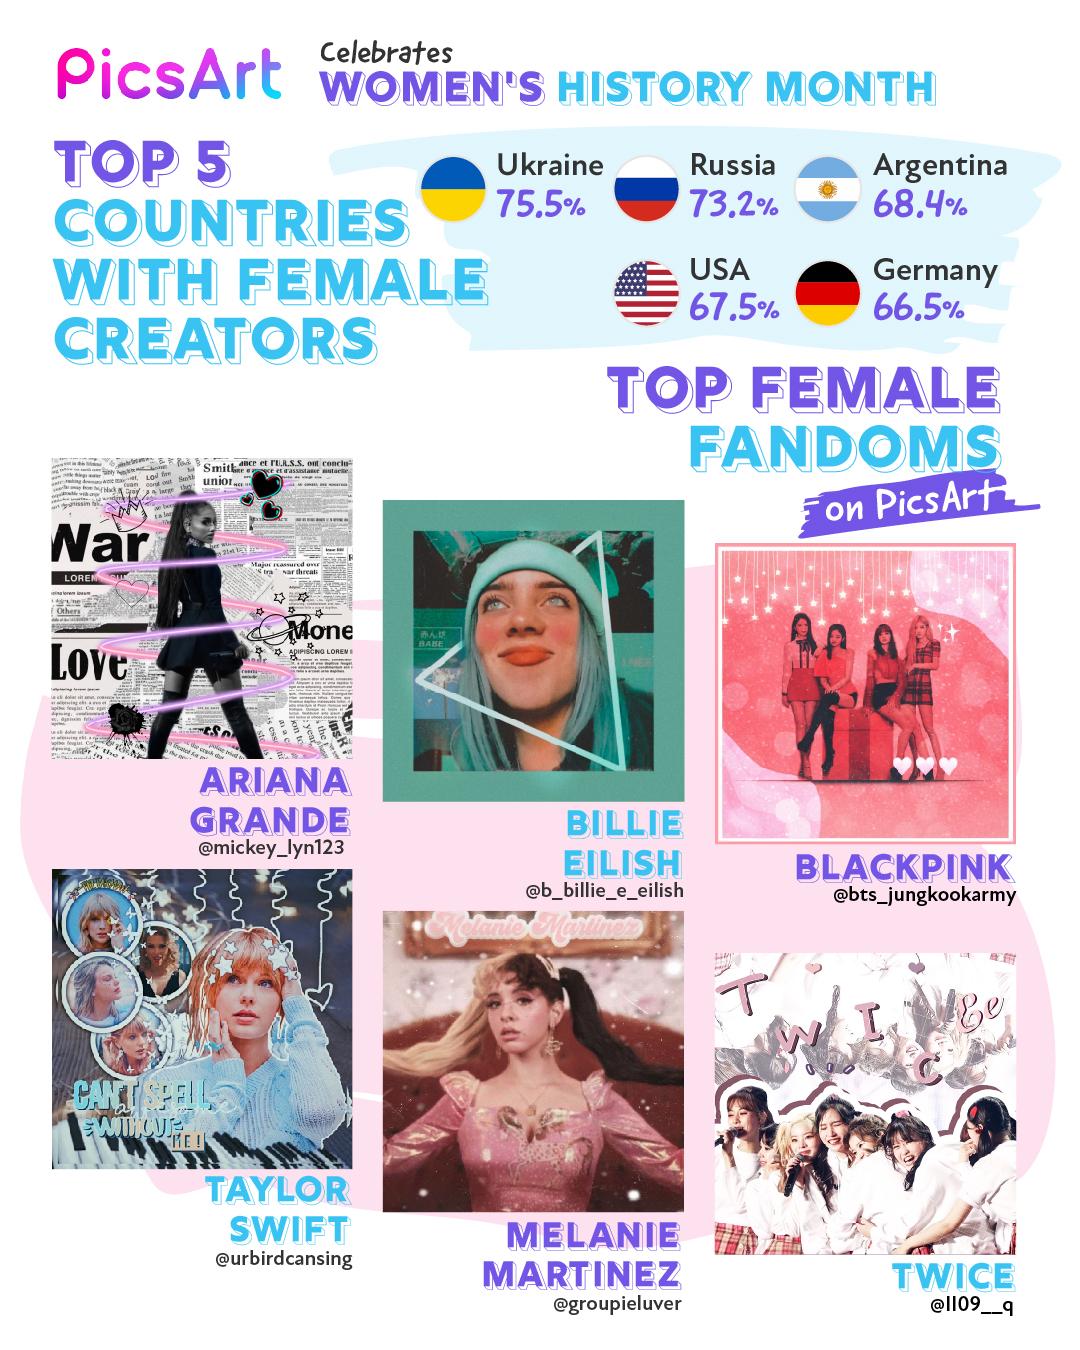 Top female fandoms: Ariana Grande, Billie Eilish, Blackpink, Taylor Swift, Melanie Martinez, TWICE